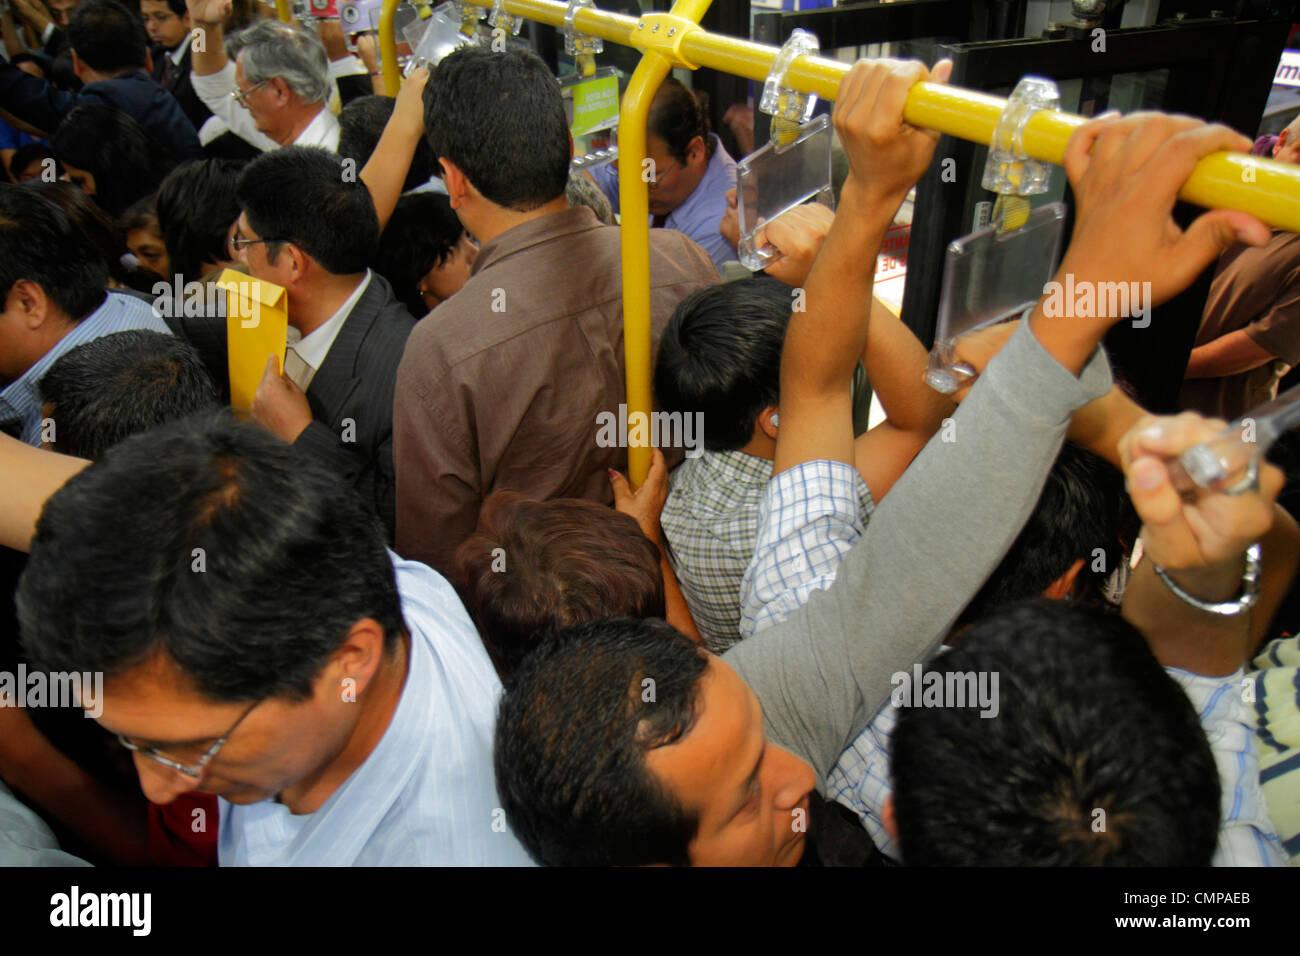 Lima Pérou Avenida Emancipacion Metropolitano Bus ligne bus des transports publics article Hispanic man passager Photo Stock